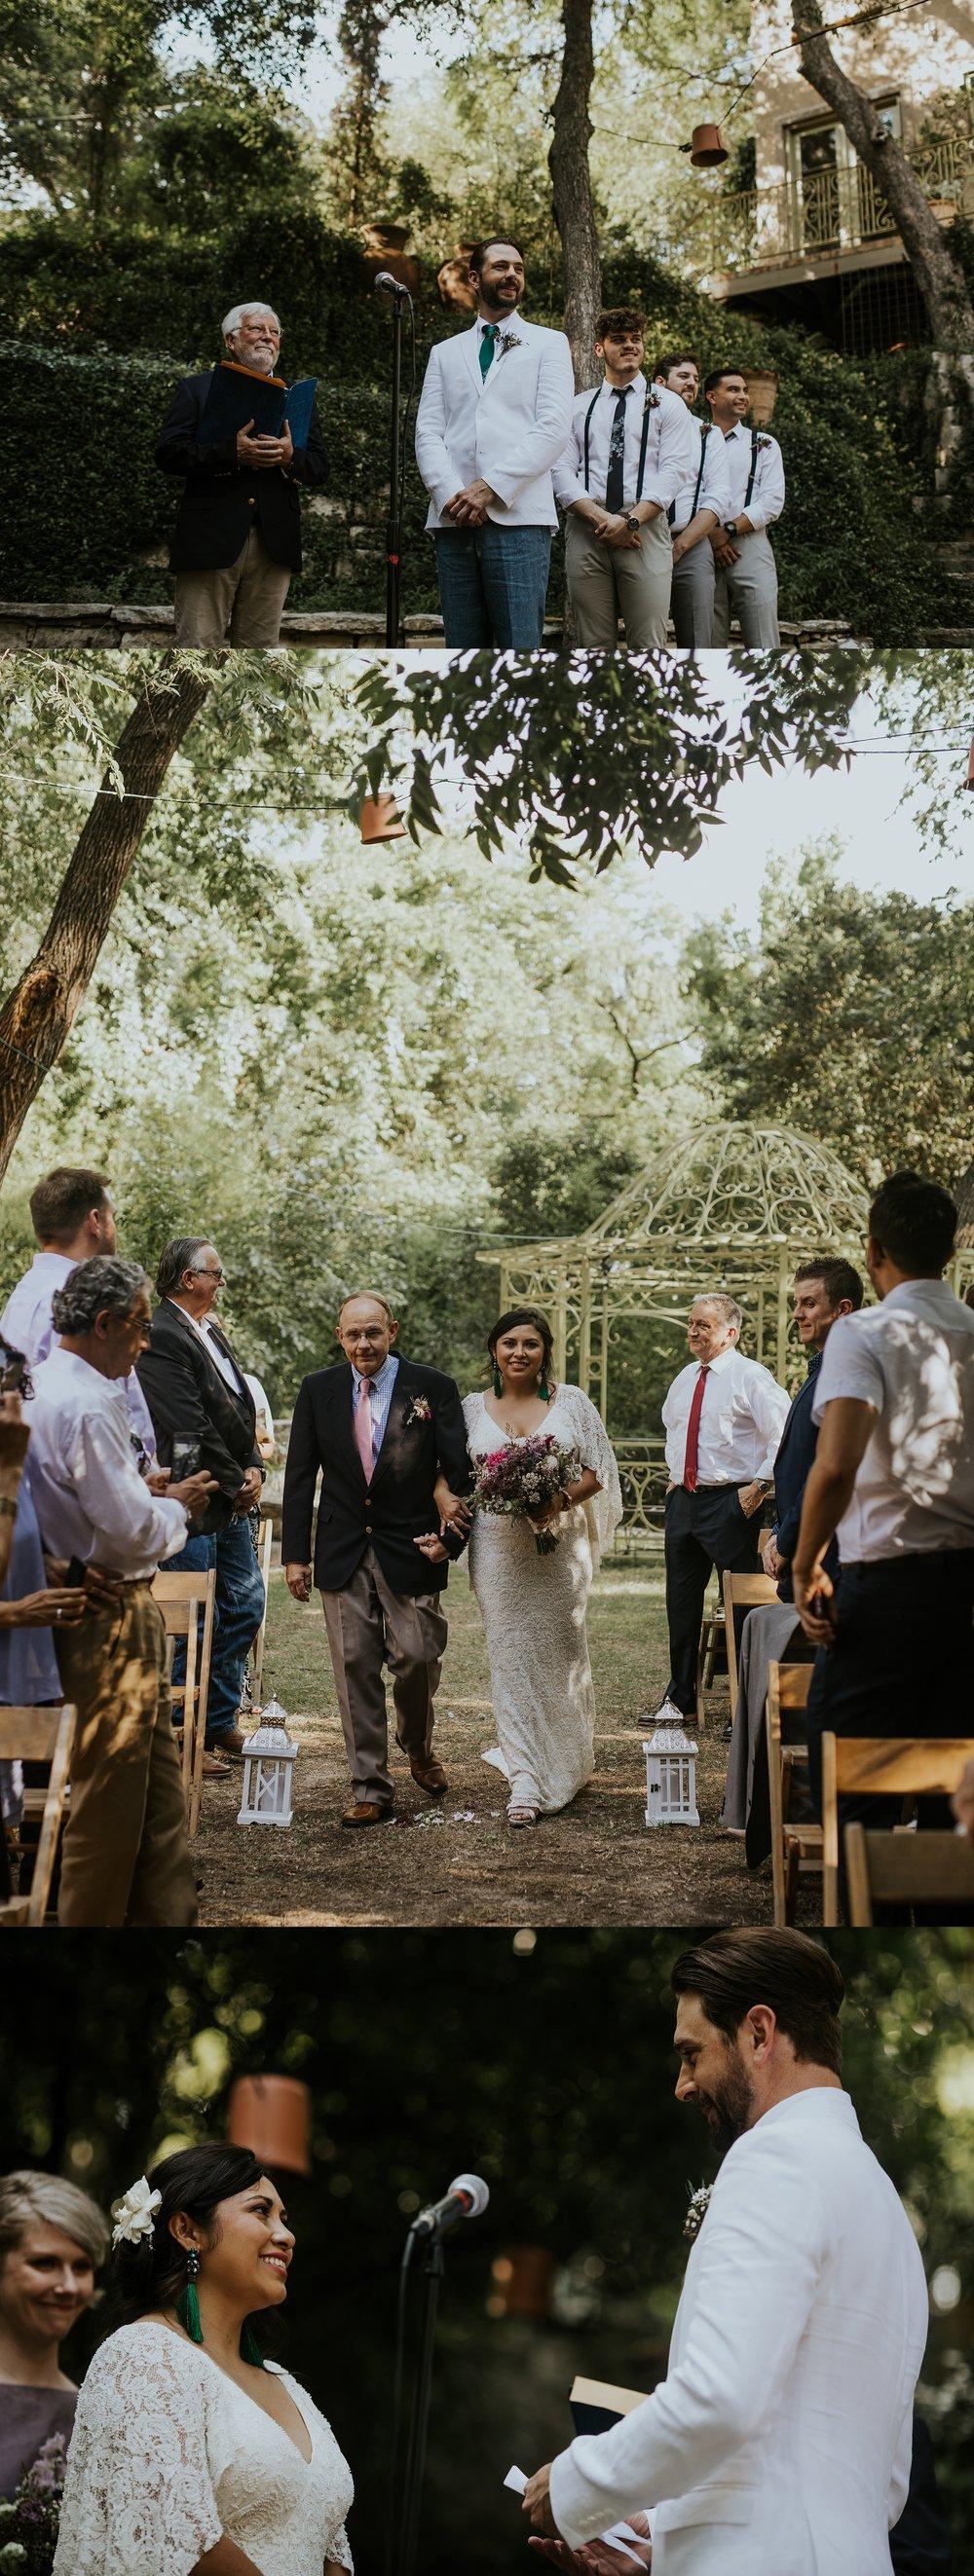 Vibrant Spring Wedding at the enchanting Jennifer's Gardens in Downtown Austin Texas_0030.jpg